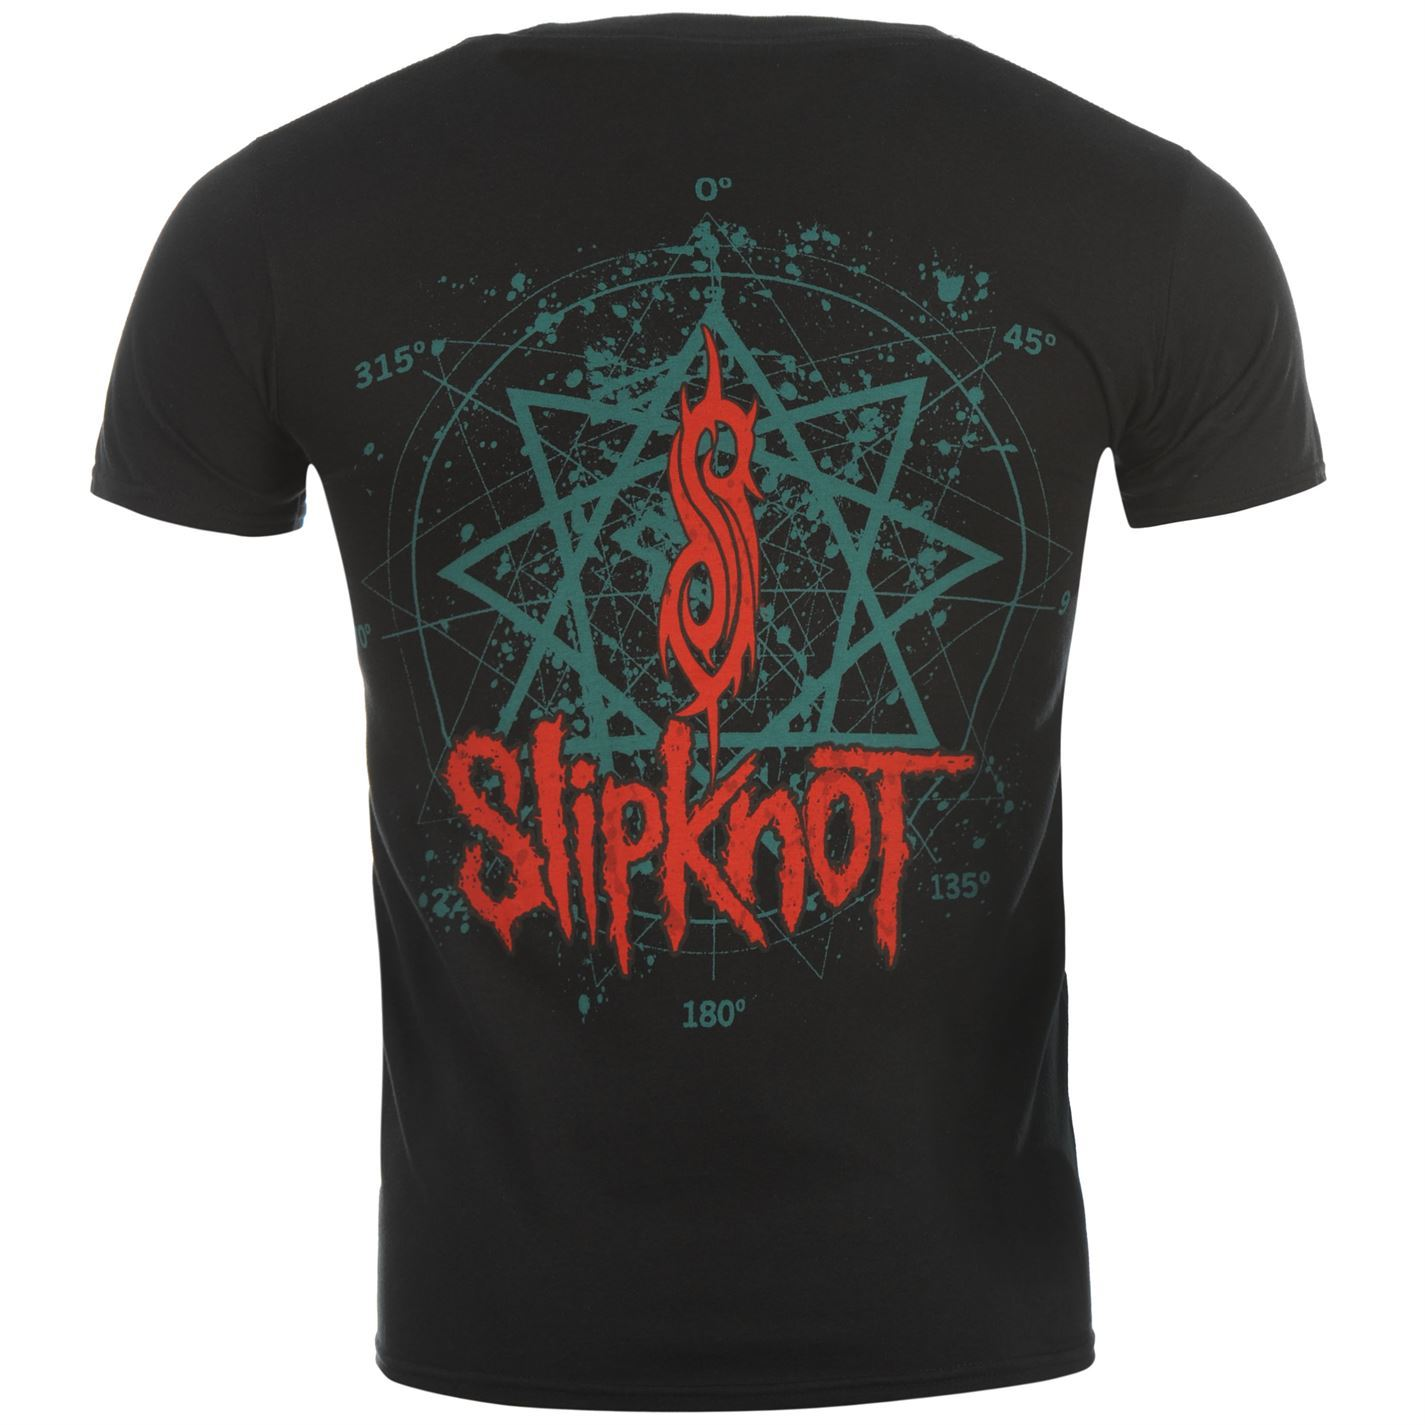 Official-Slipknot-T-Shirt-Mens-Masks-Top-Tee-Tshirt thumbnail 4